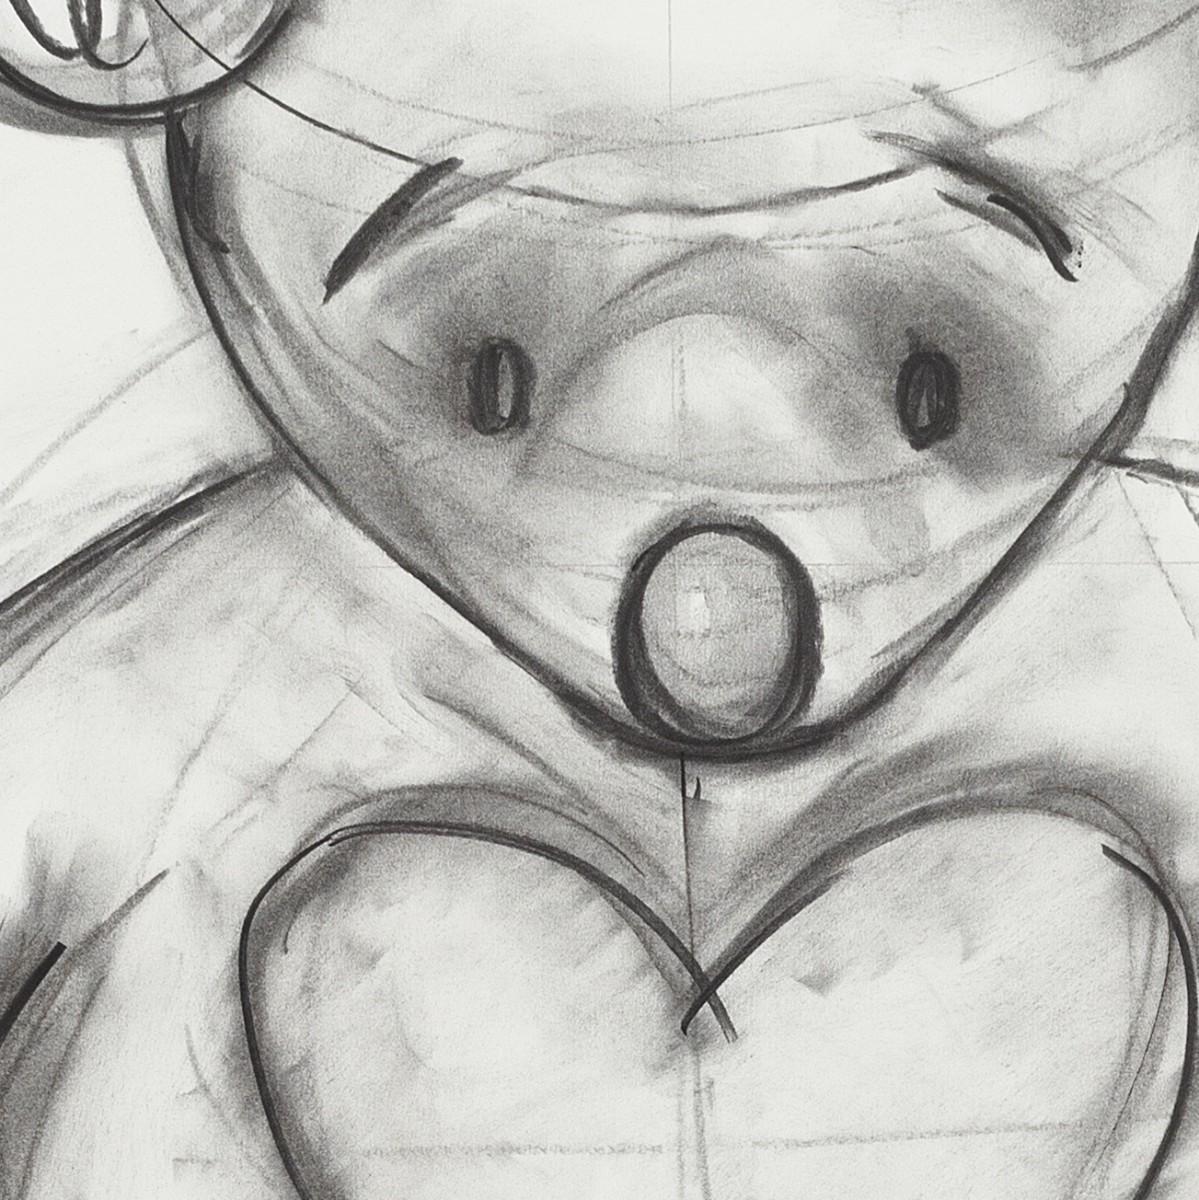 Details: Simon Fujiwara, Who is Who? (Binary Sex Selection), 2021, charcoal, acrylic, pencil and inkjet print on paper, 70 x 100 cm (27 1/2 x 39 3/8 in) (unframed), 107 x 77 x 3,5 cm (42 1/8 x 30 1/4 x 1 3/8 in) (framed). Photo © CHROMA